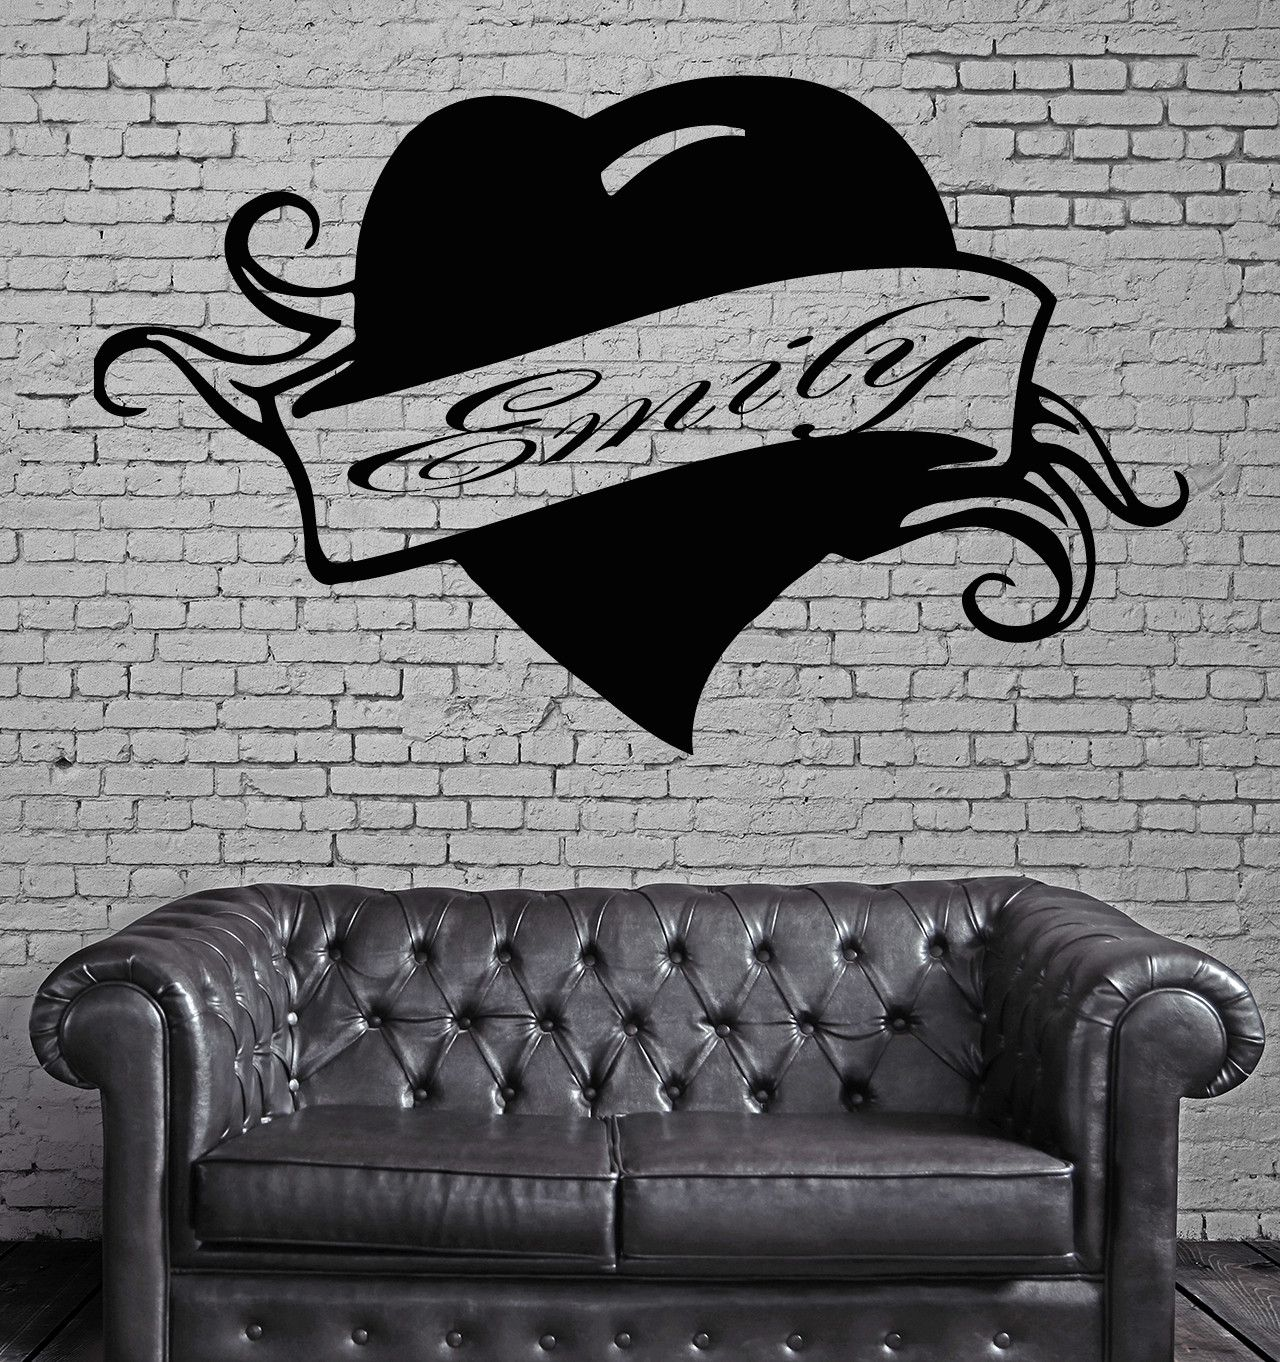 emily personalized name lettering custom wall art decor vinyl sticker z981